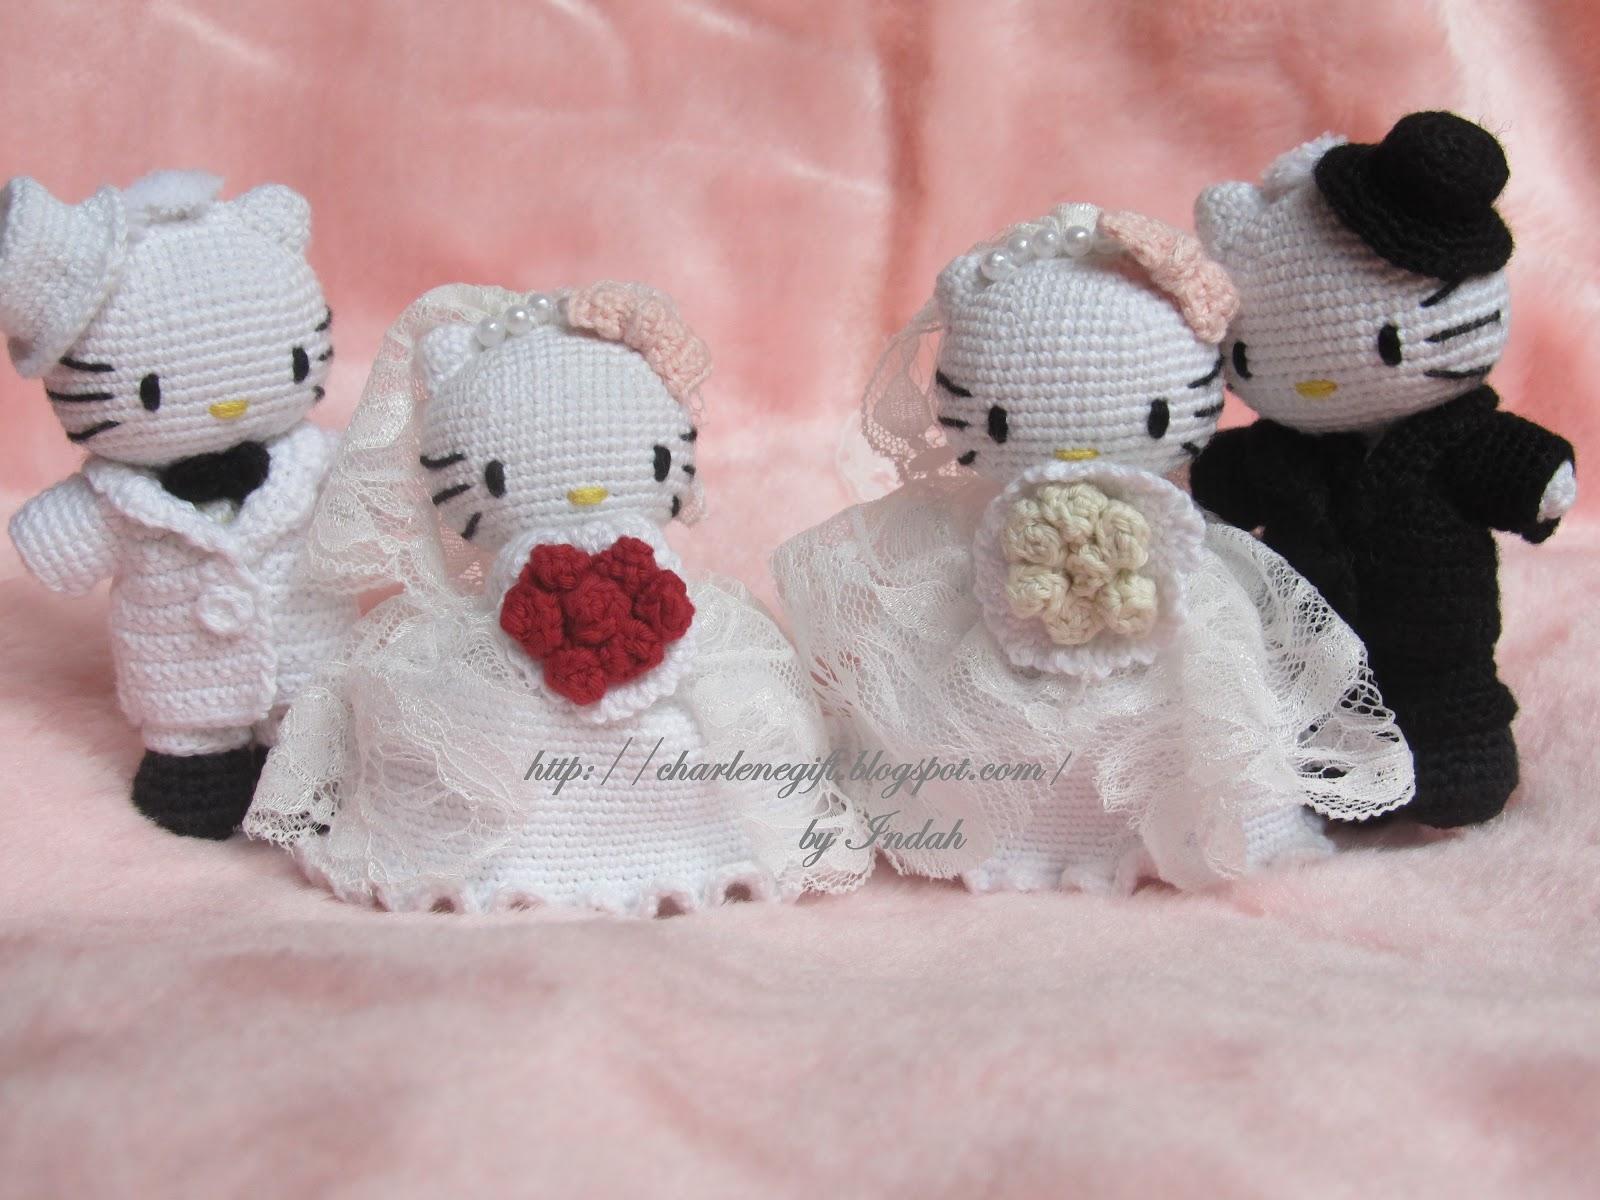 Amigurumi Free Patterns Hello Kitty : Amigurumi @ charlene gift n craft